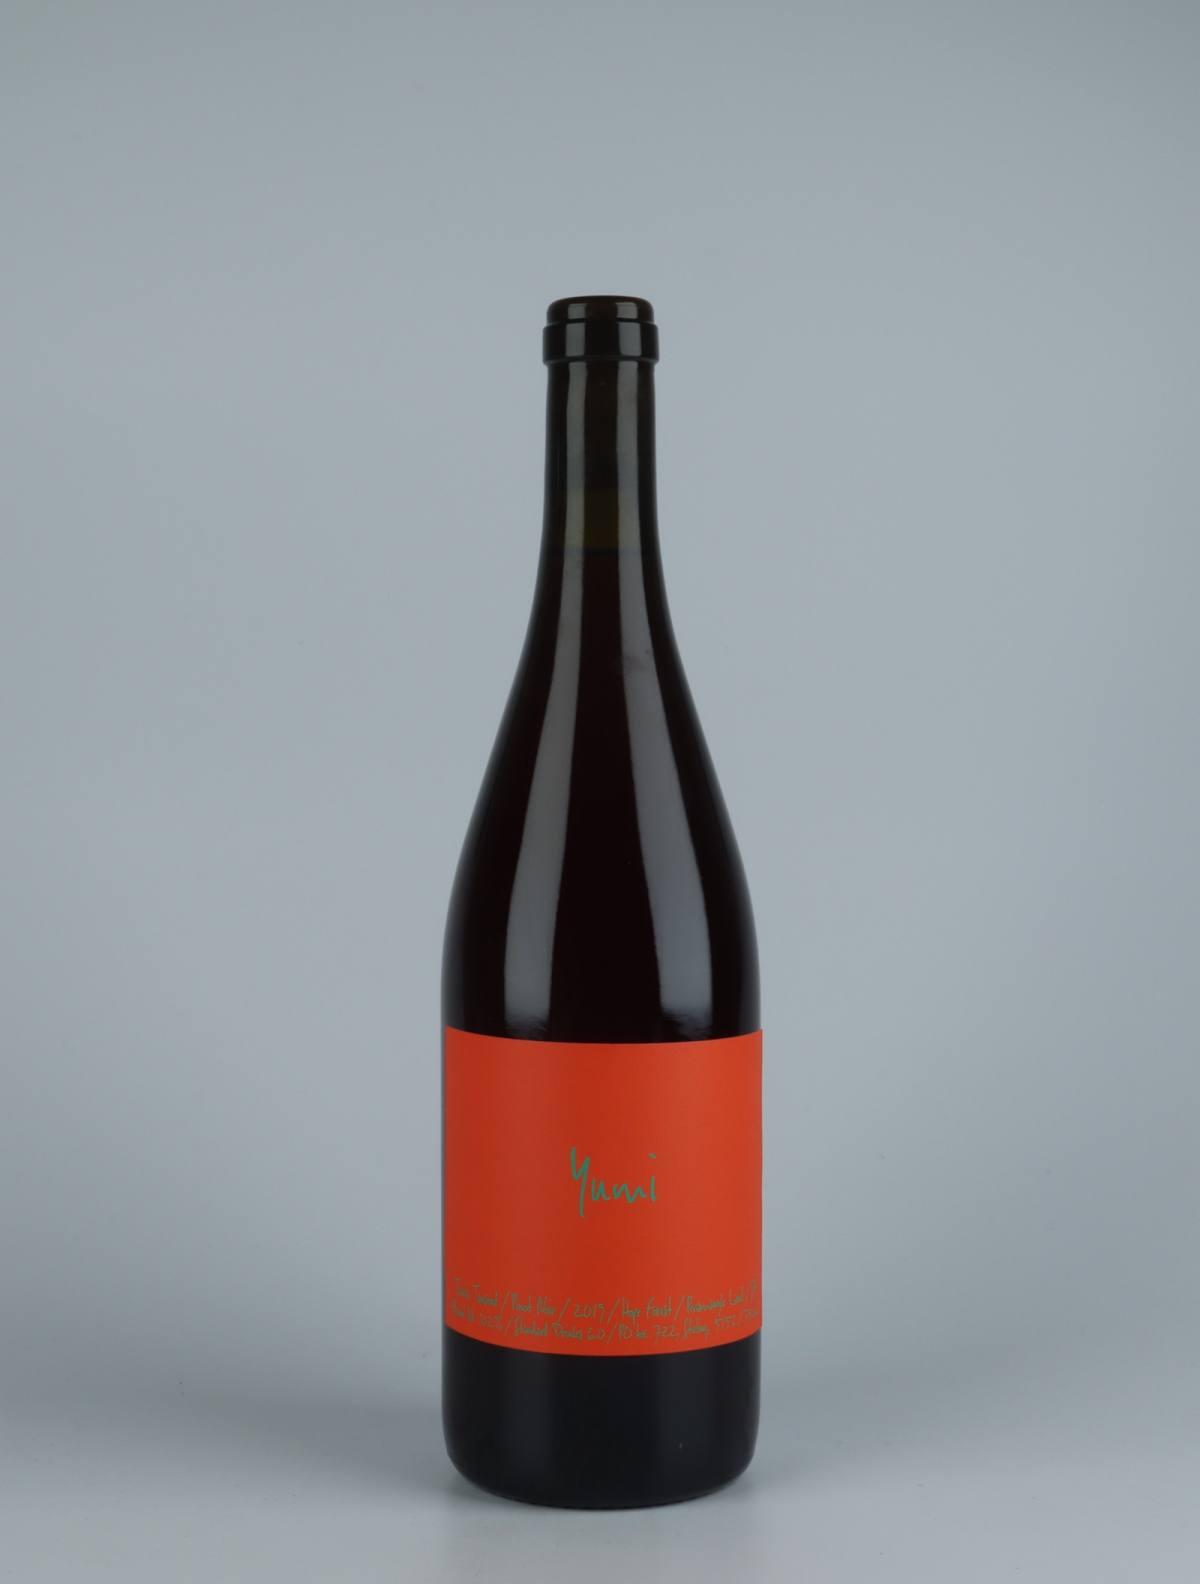 Yumi Pinot Noir